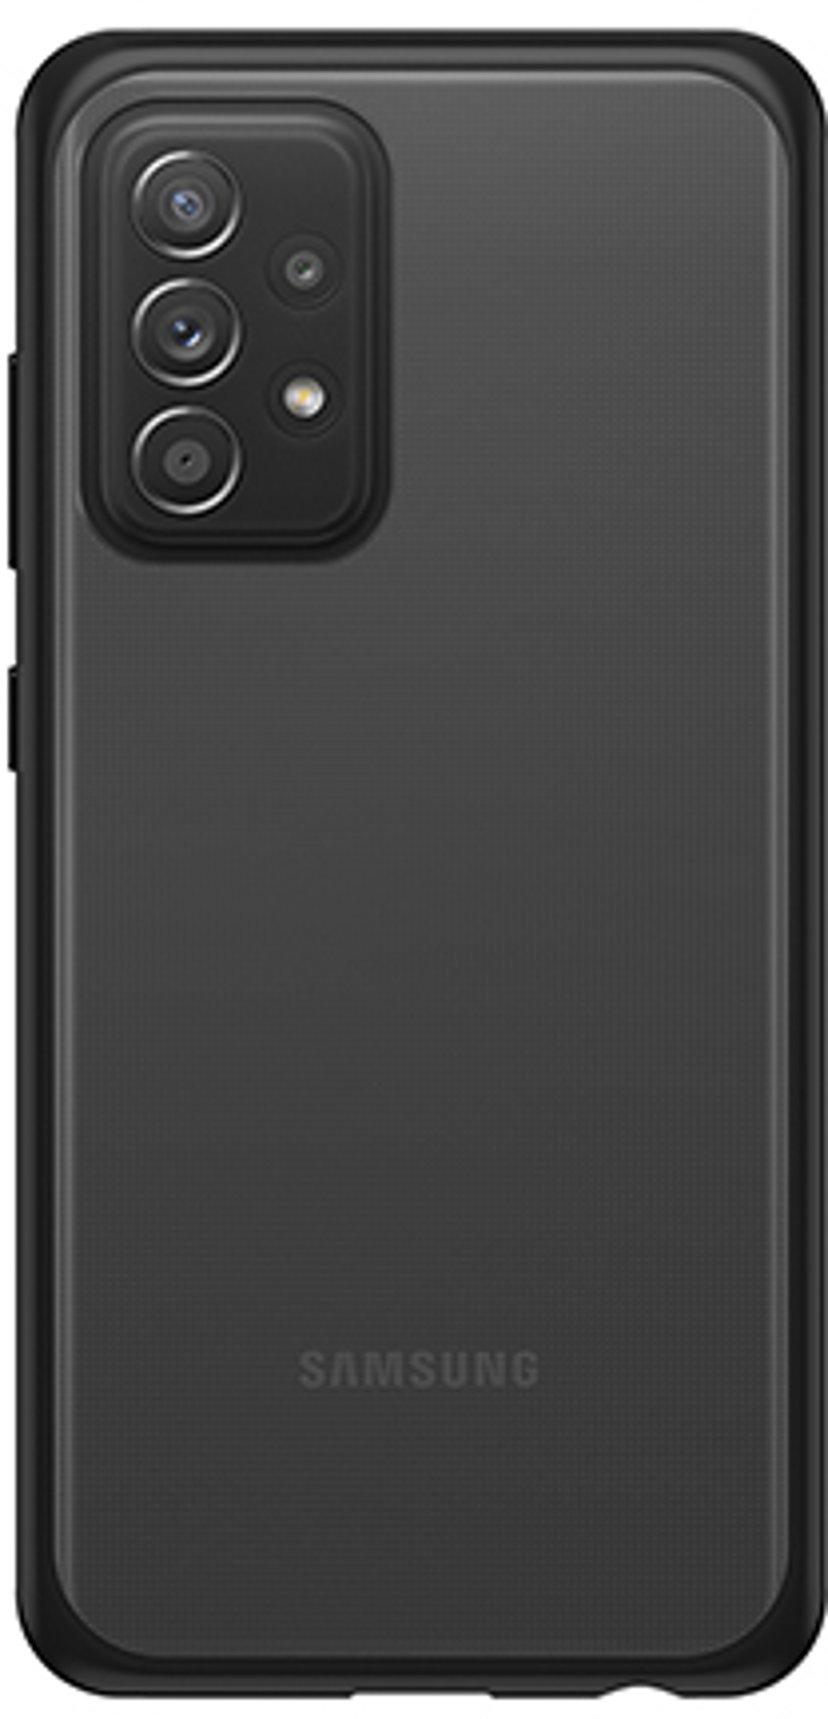 Otterbox React Series Samsung Galaxy A52, Samsung Galaxy A52 5G Svart kristall